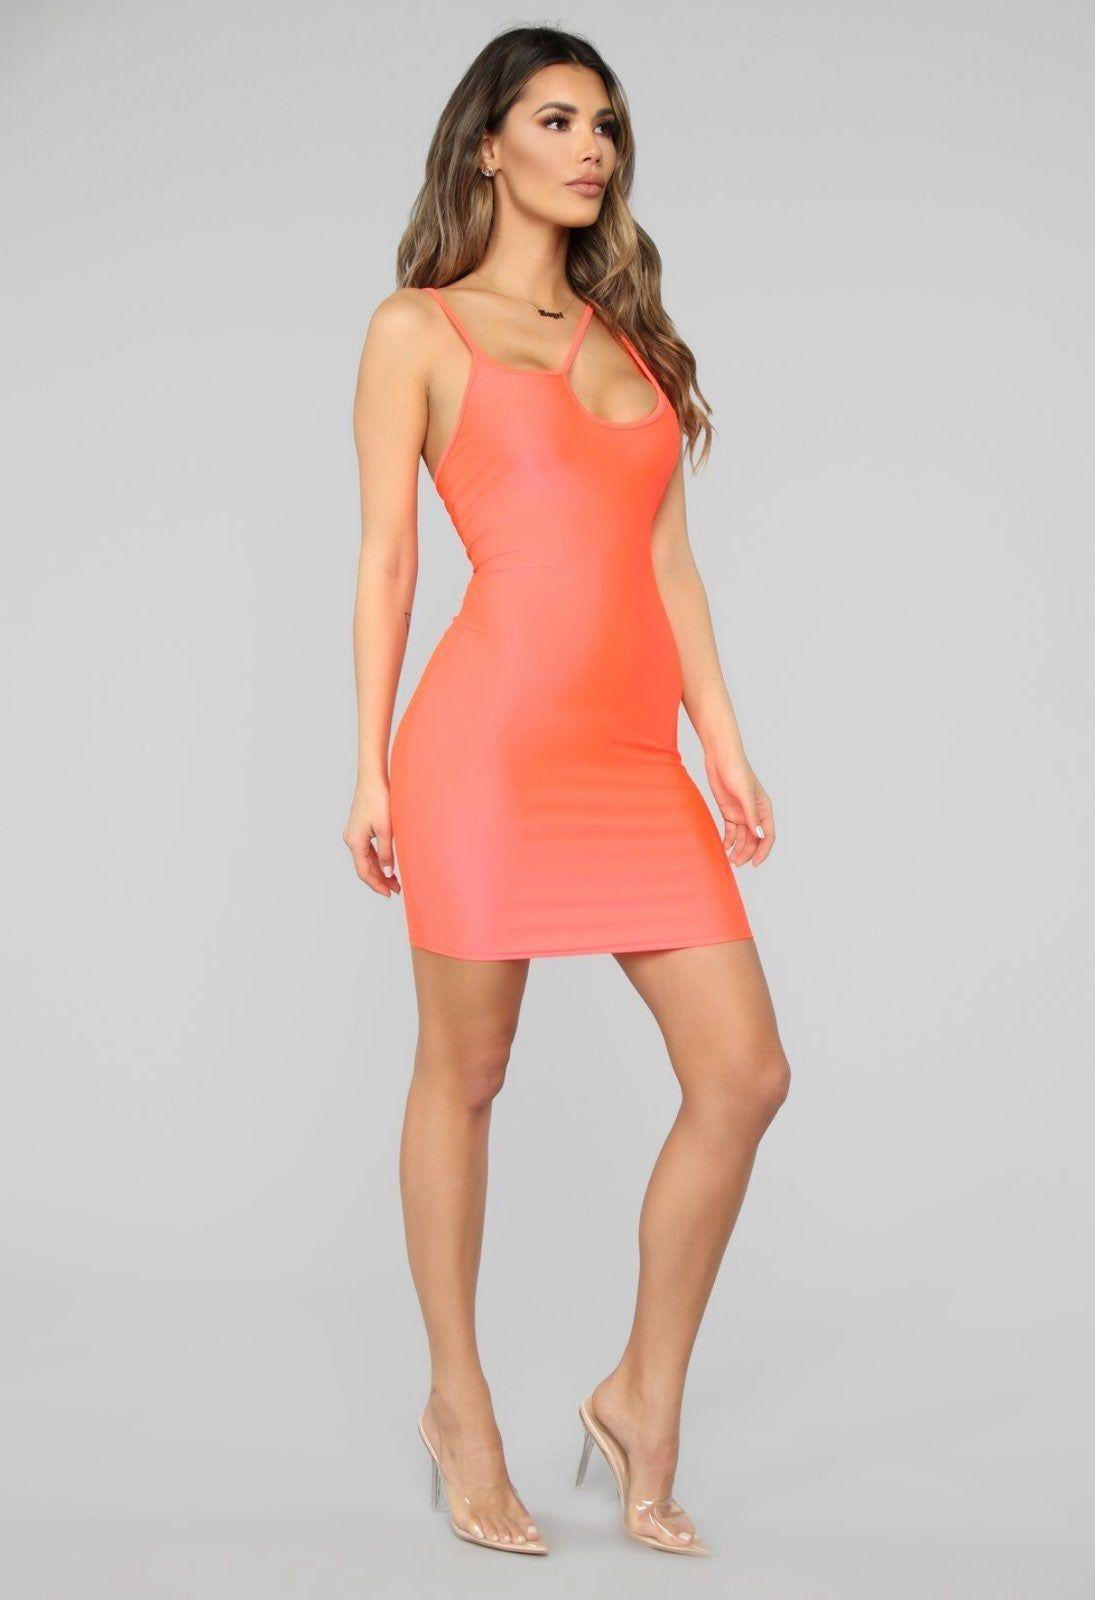 Neon orange dress. Never worn. XS (With images) Mini